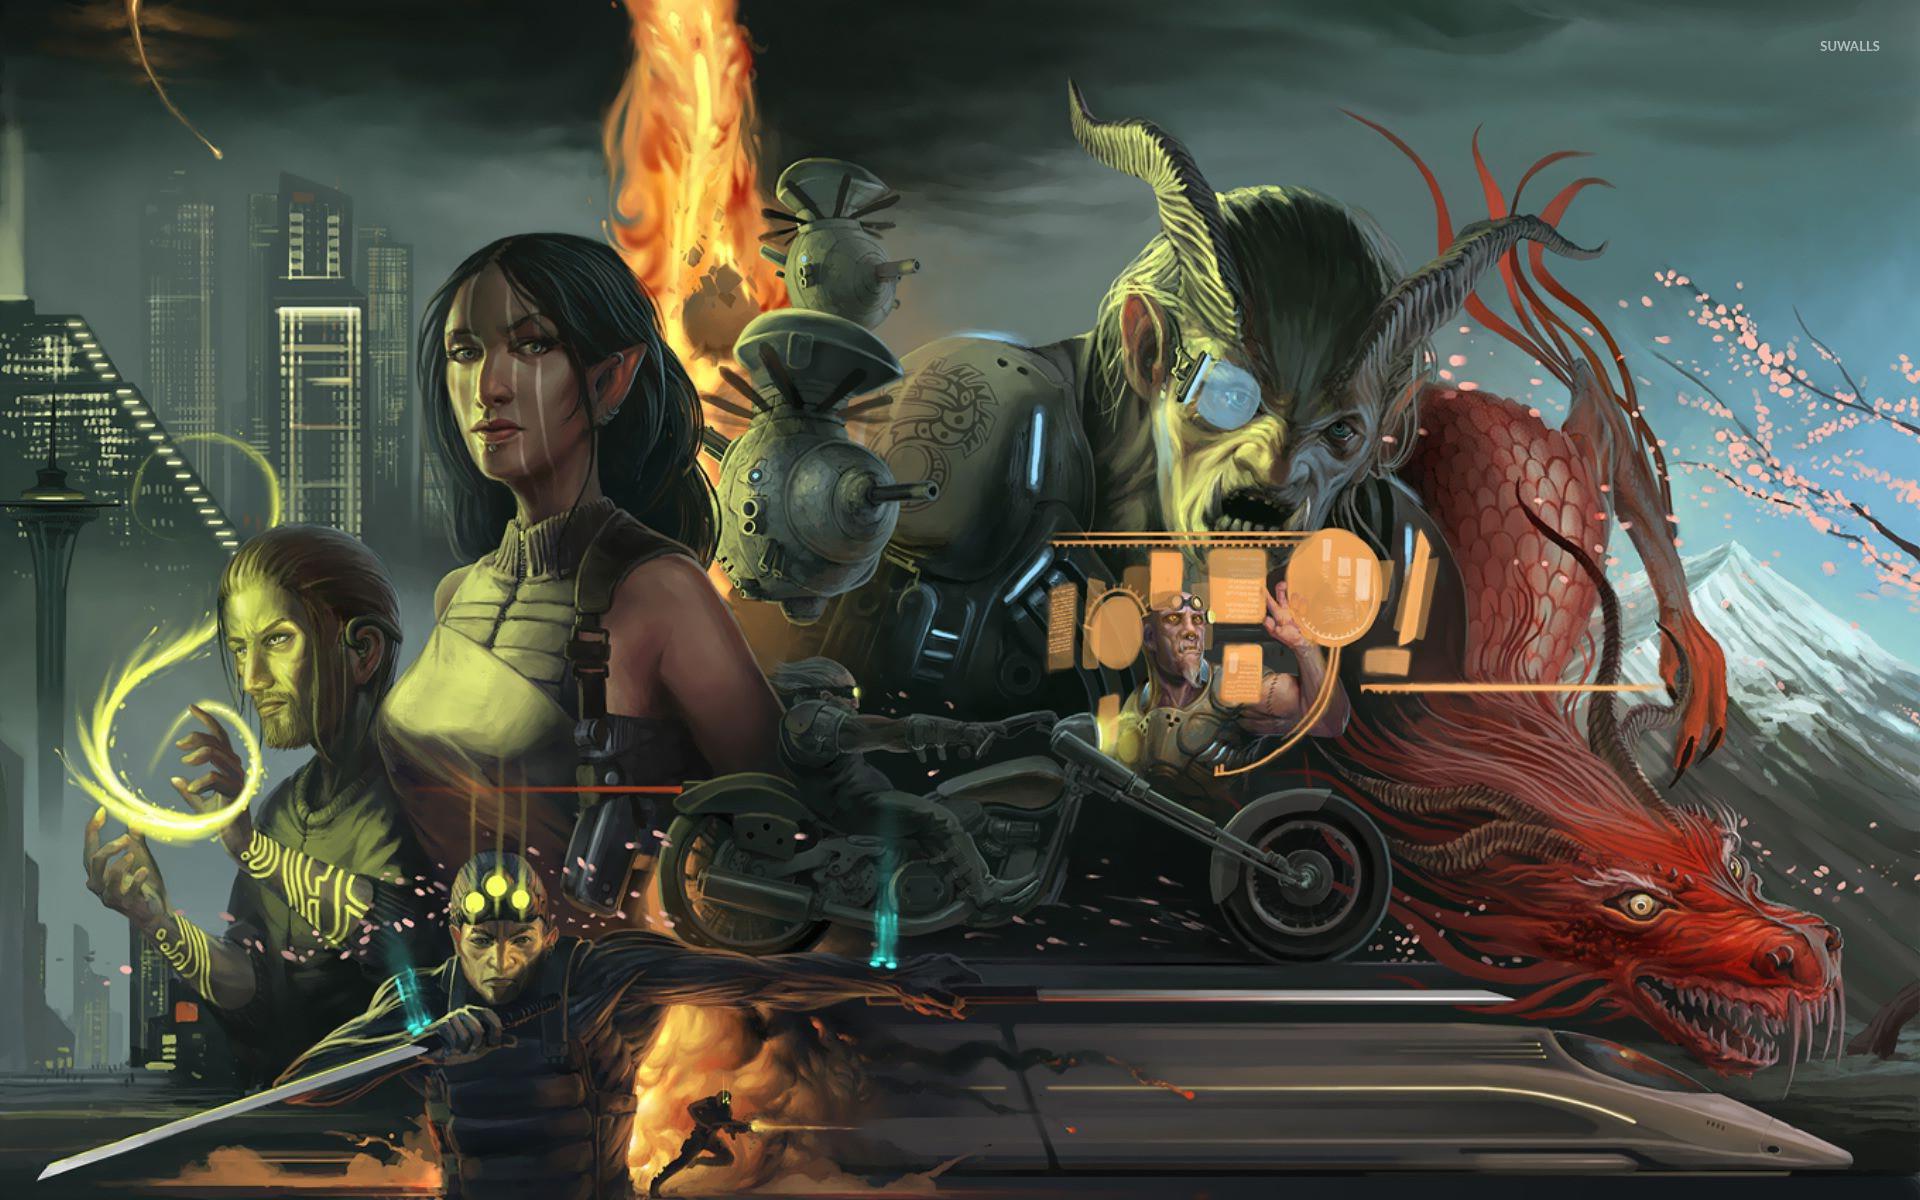 Shadowrun Returns Wallpaper